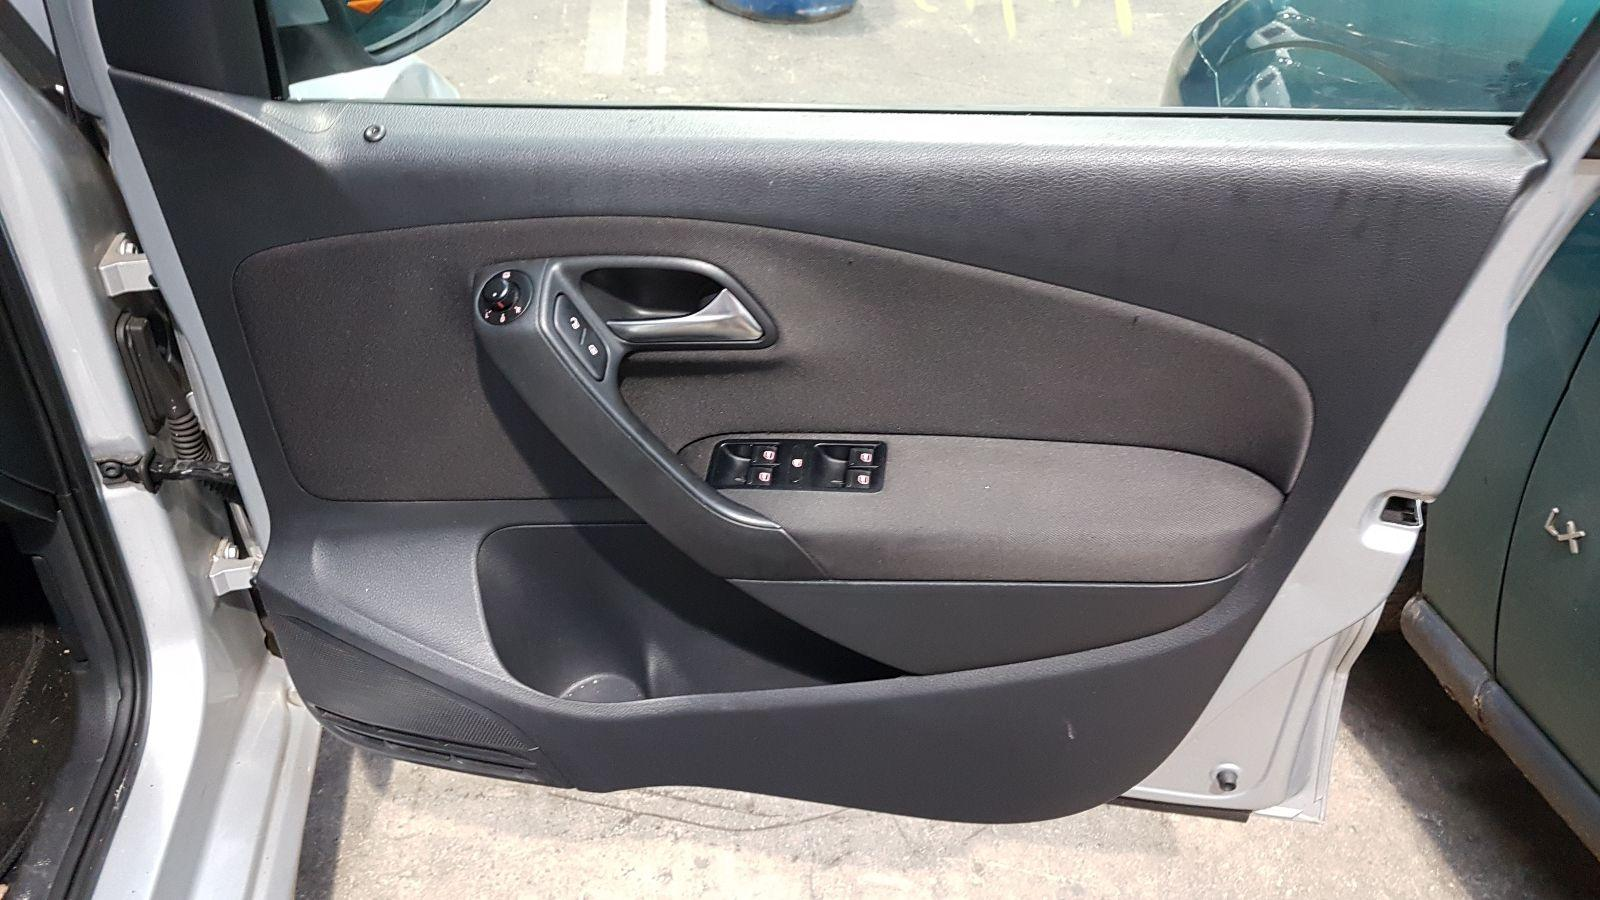 View Auto part Gearbox Volkswagen Polo 2012